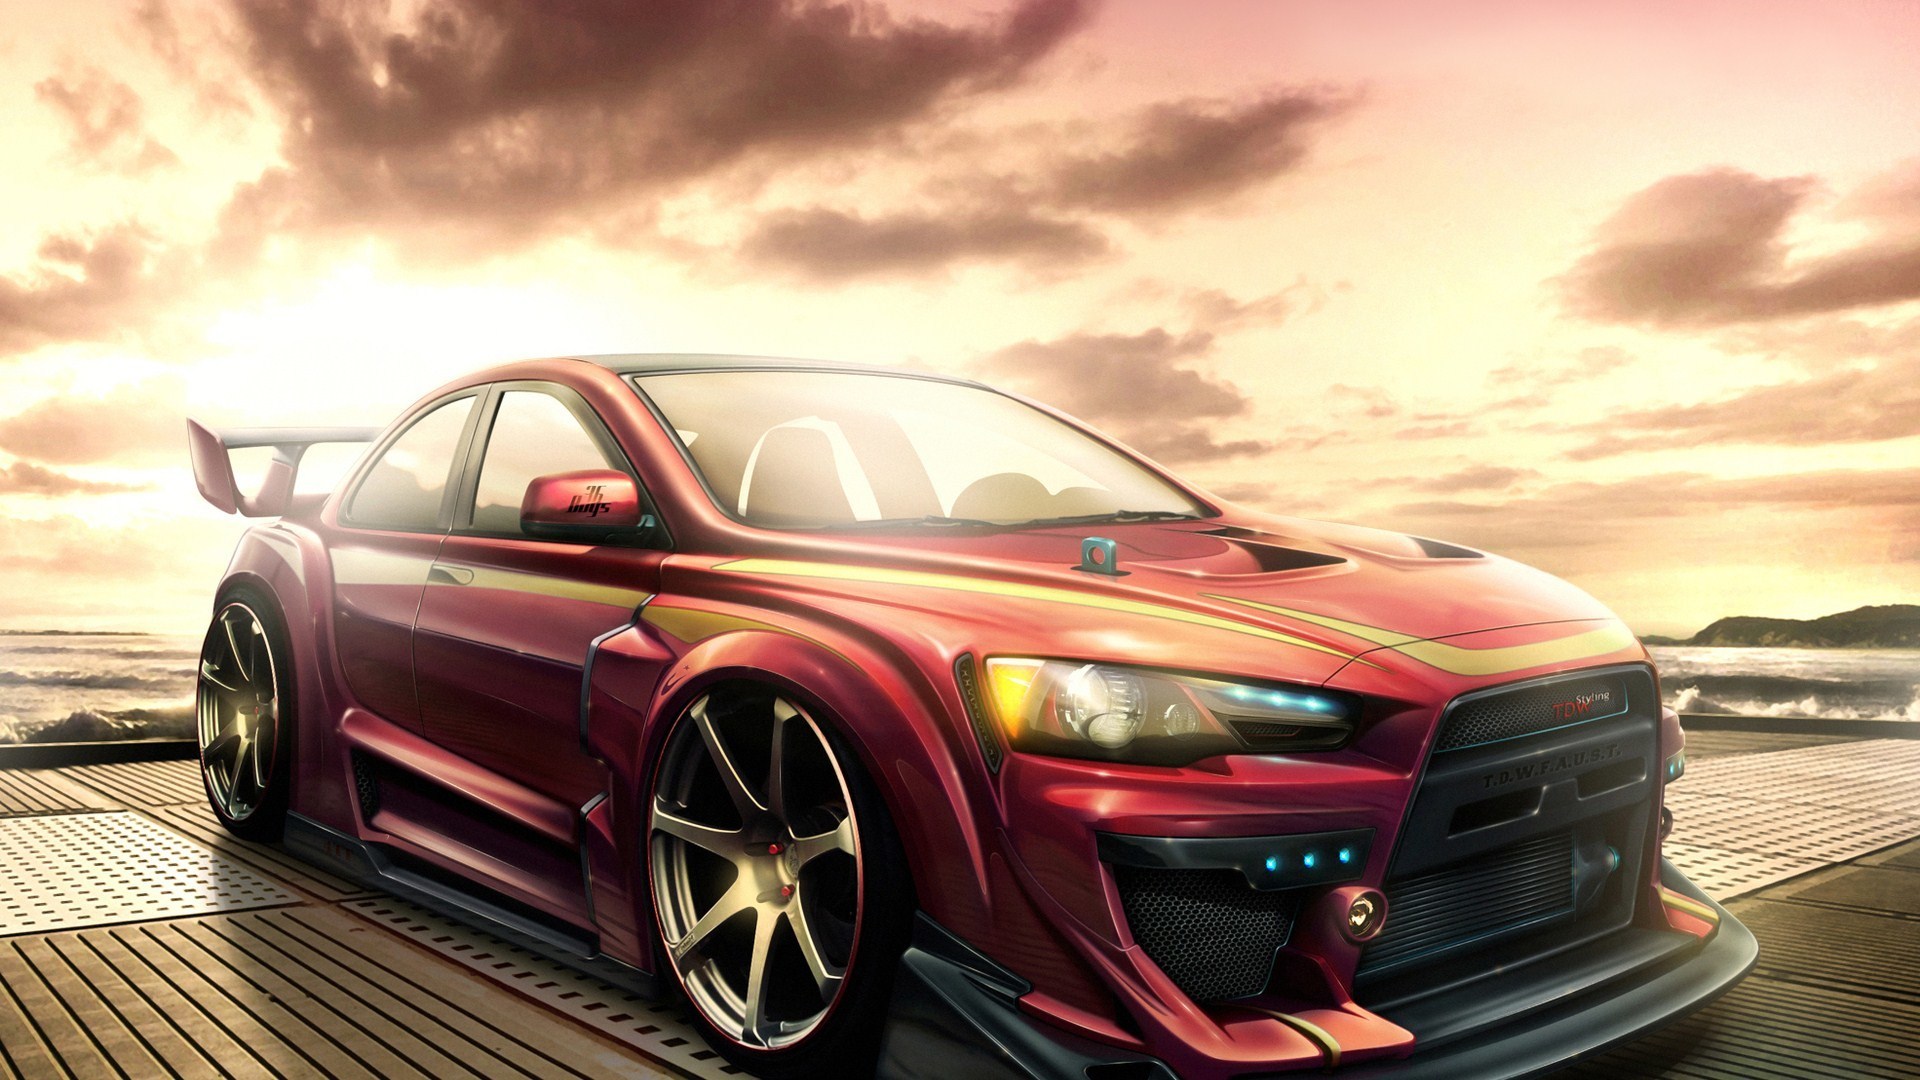 Mitsubishi Lancer Wallpaper Hd jpg x desktop wallpaper 161482